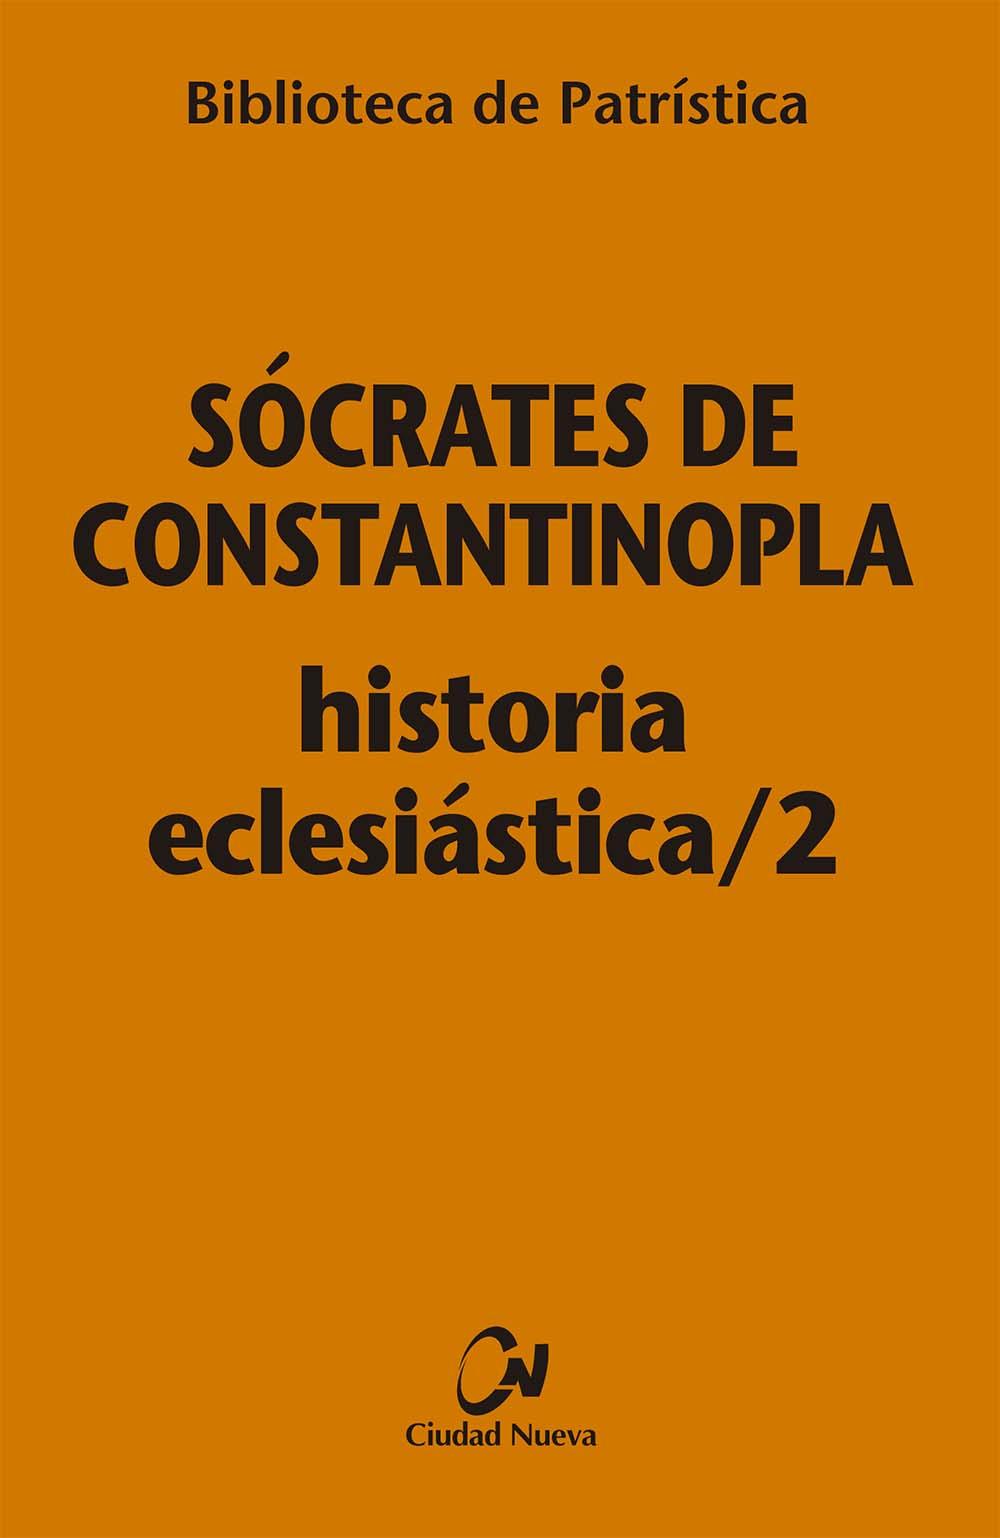 historia-eclesiastica-2-[bpa-107]